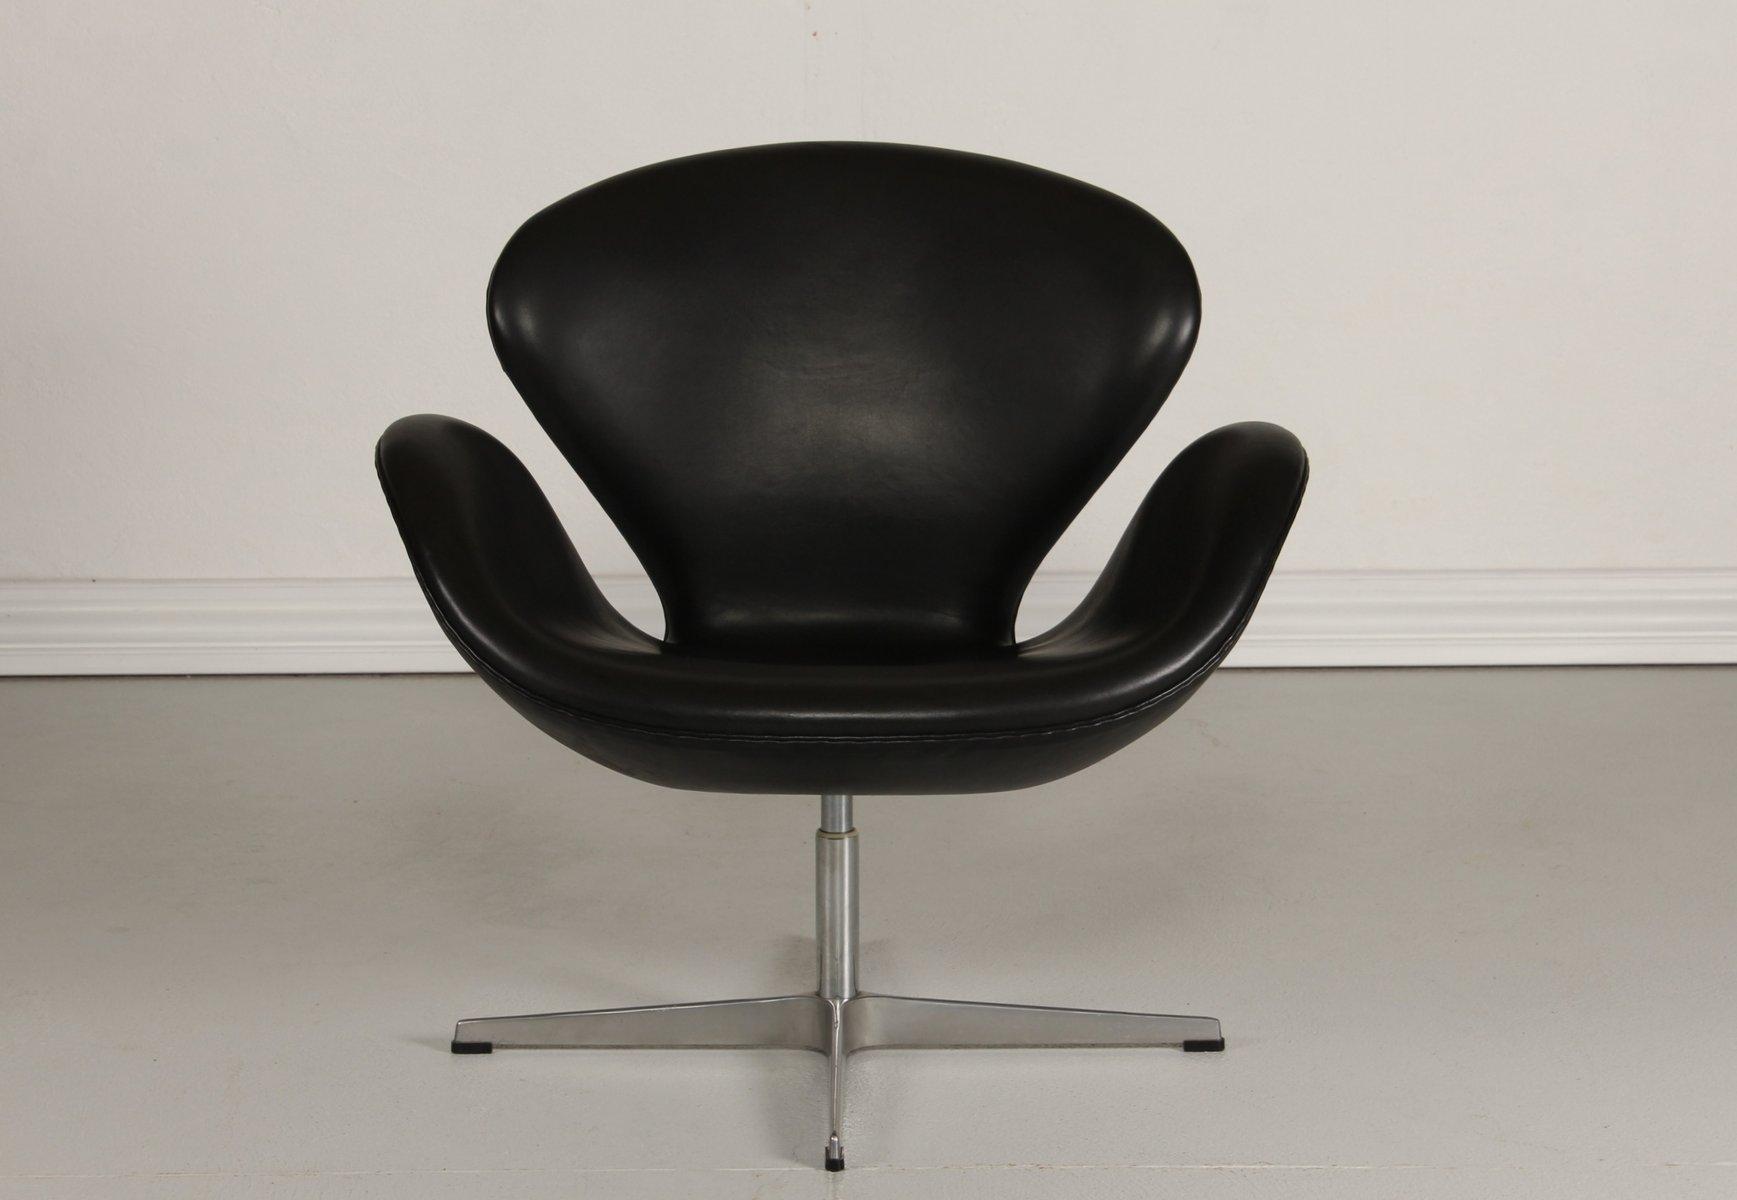 black swan chair by arne jacobsen for fritz hansen 1981 for sale at pamono. Black Bedroom Furniture Sets. Home Design Ideas